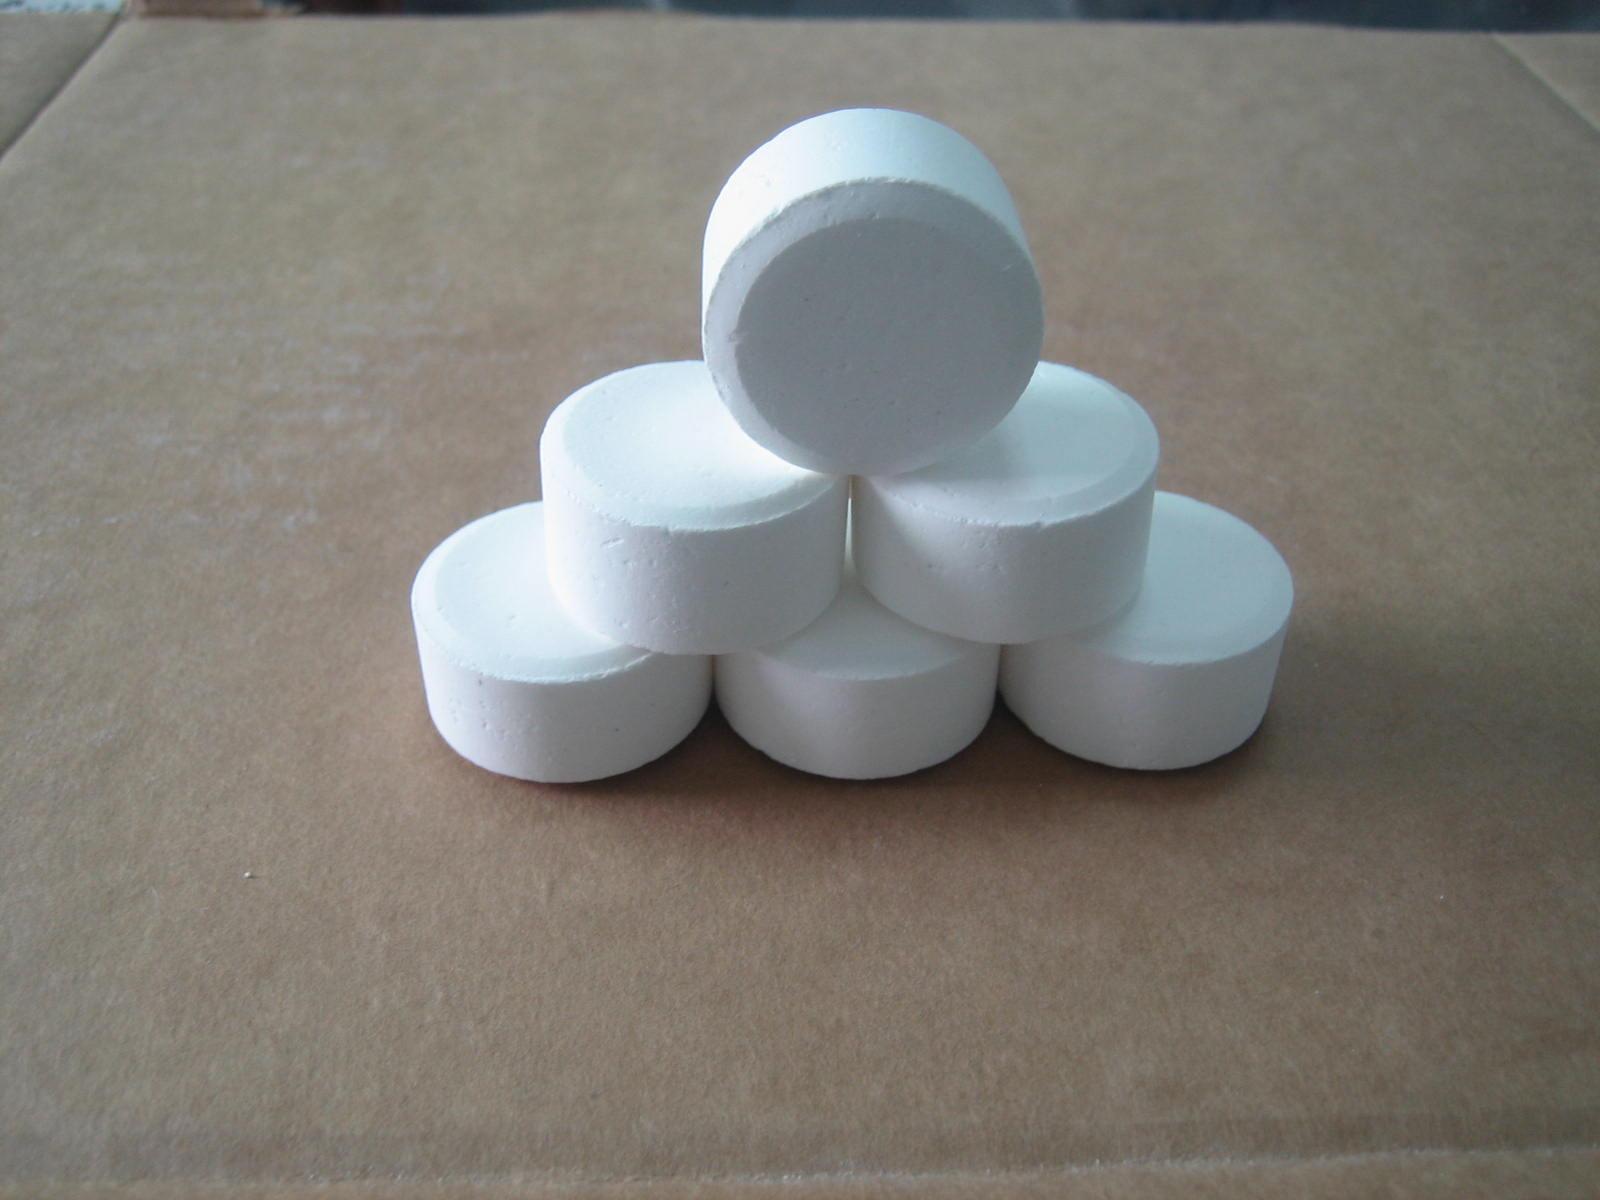 TCCA 90% Trichloroisocyanuric Acid 90% Powder Granular Tablet